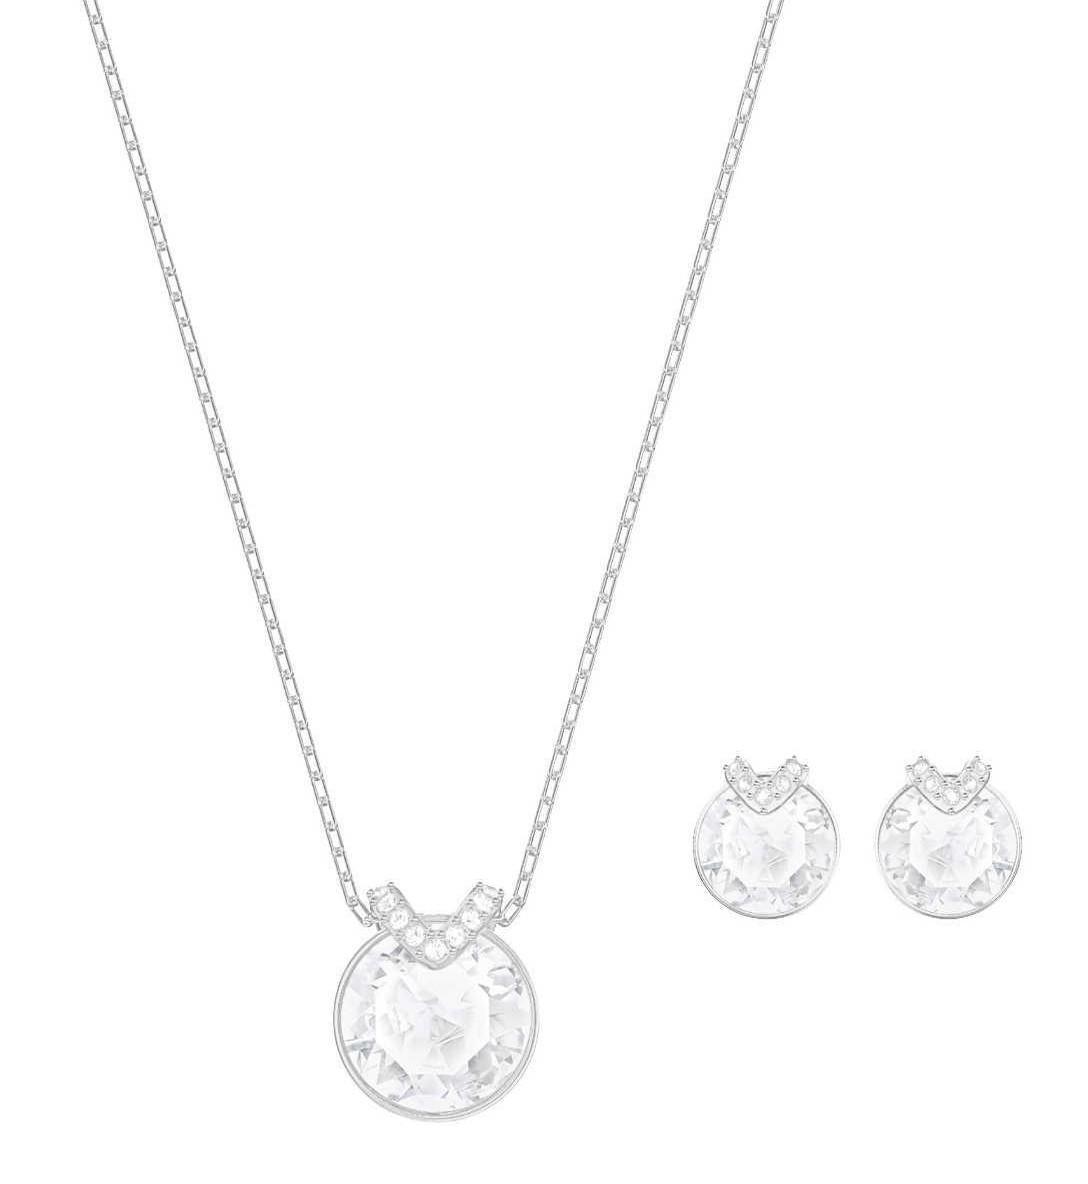 Swarovski Set Ketting Oorknoppen 'Bella V' White-Silver 5299319